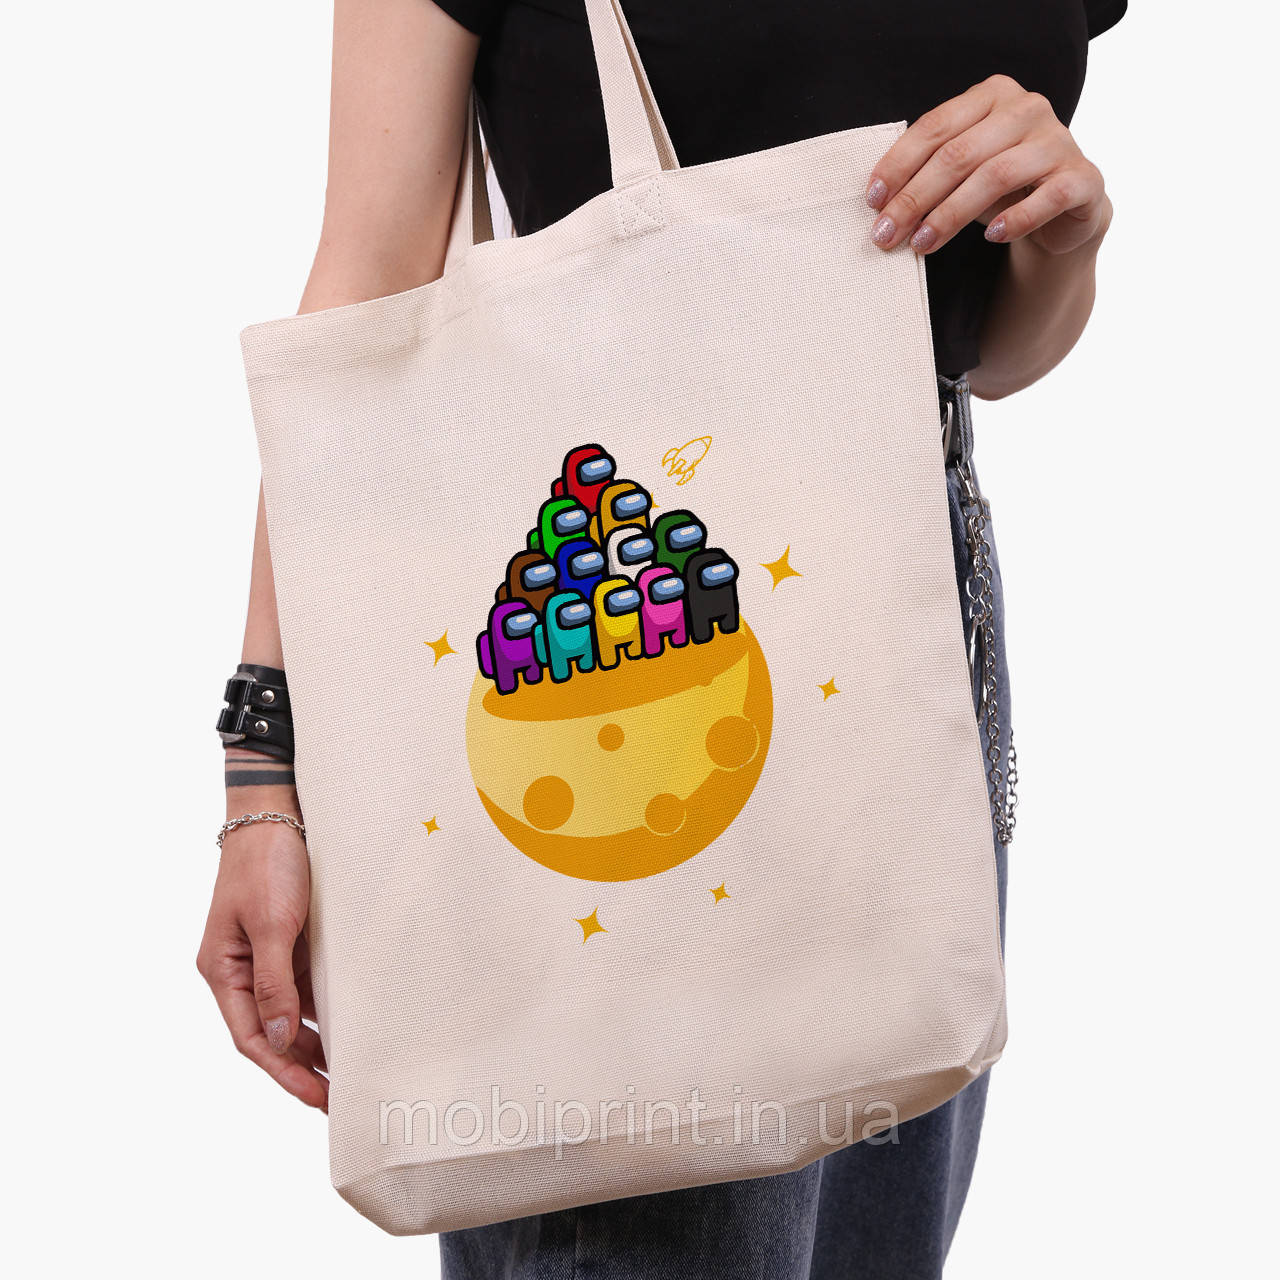 Еко сумка шоппер біла Амонг Ас (Among Us) (9227-2584-1) 41*39*8 см